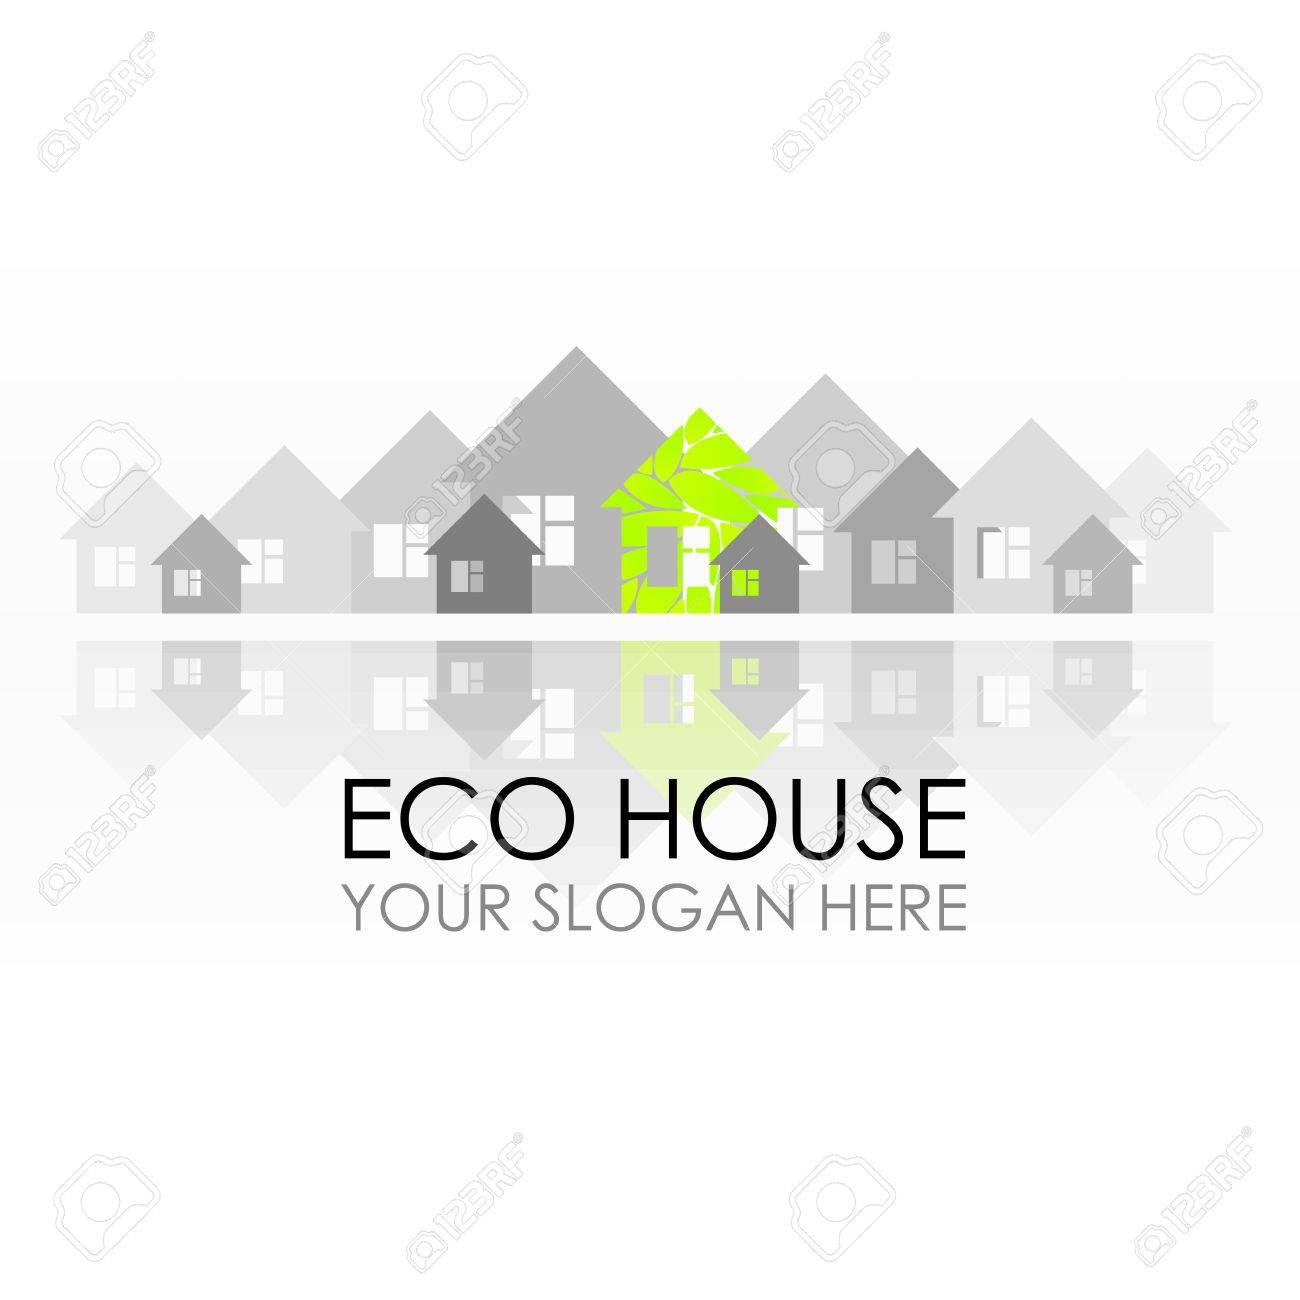 Eco house logo design. Ecological construction. Eco architecture...